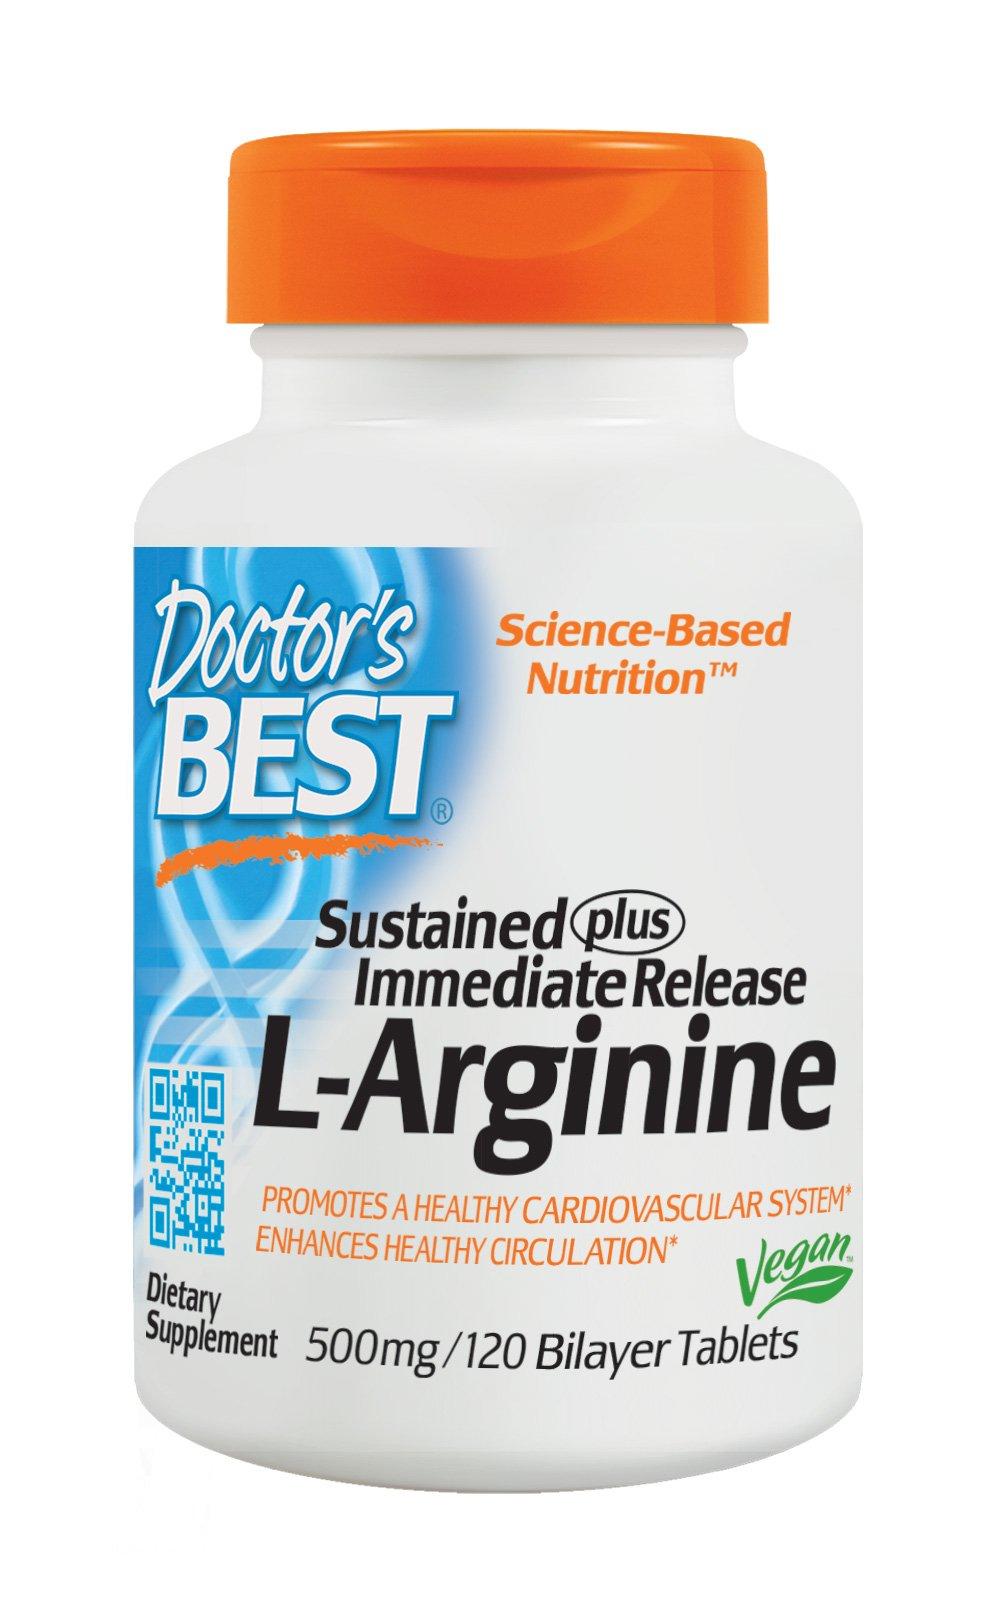 Doctor's Best Sustained Plus Immediate Release L-Arginine, Non-GMO, Vegan, Gluten Free, Soy Free, 500 mg, 120 Bilayer Tablets by Doctor's Best